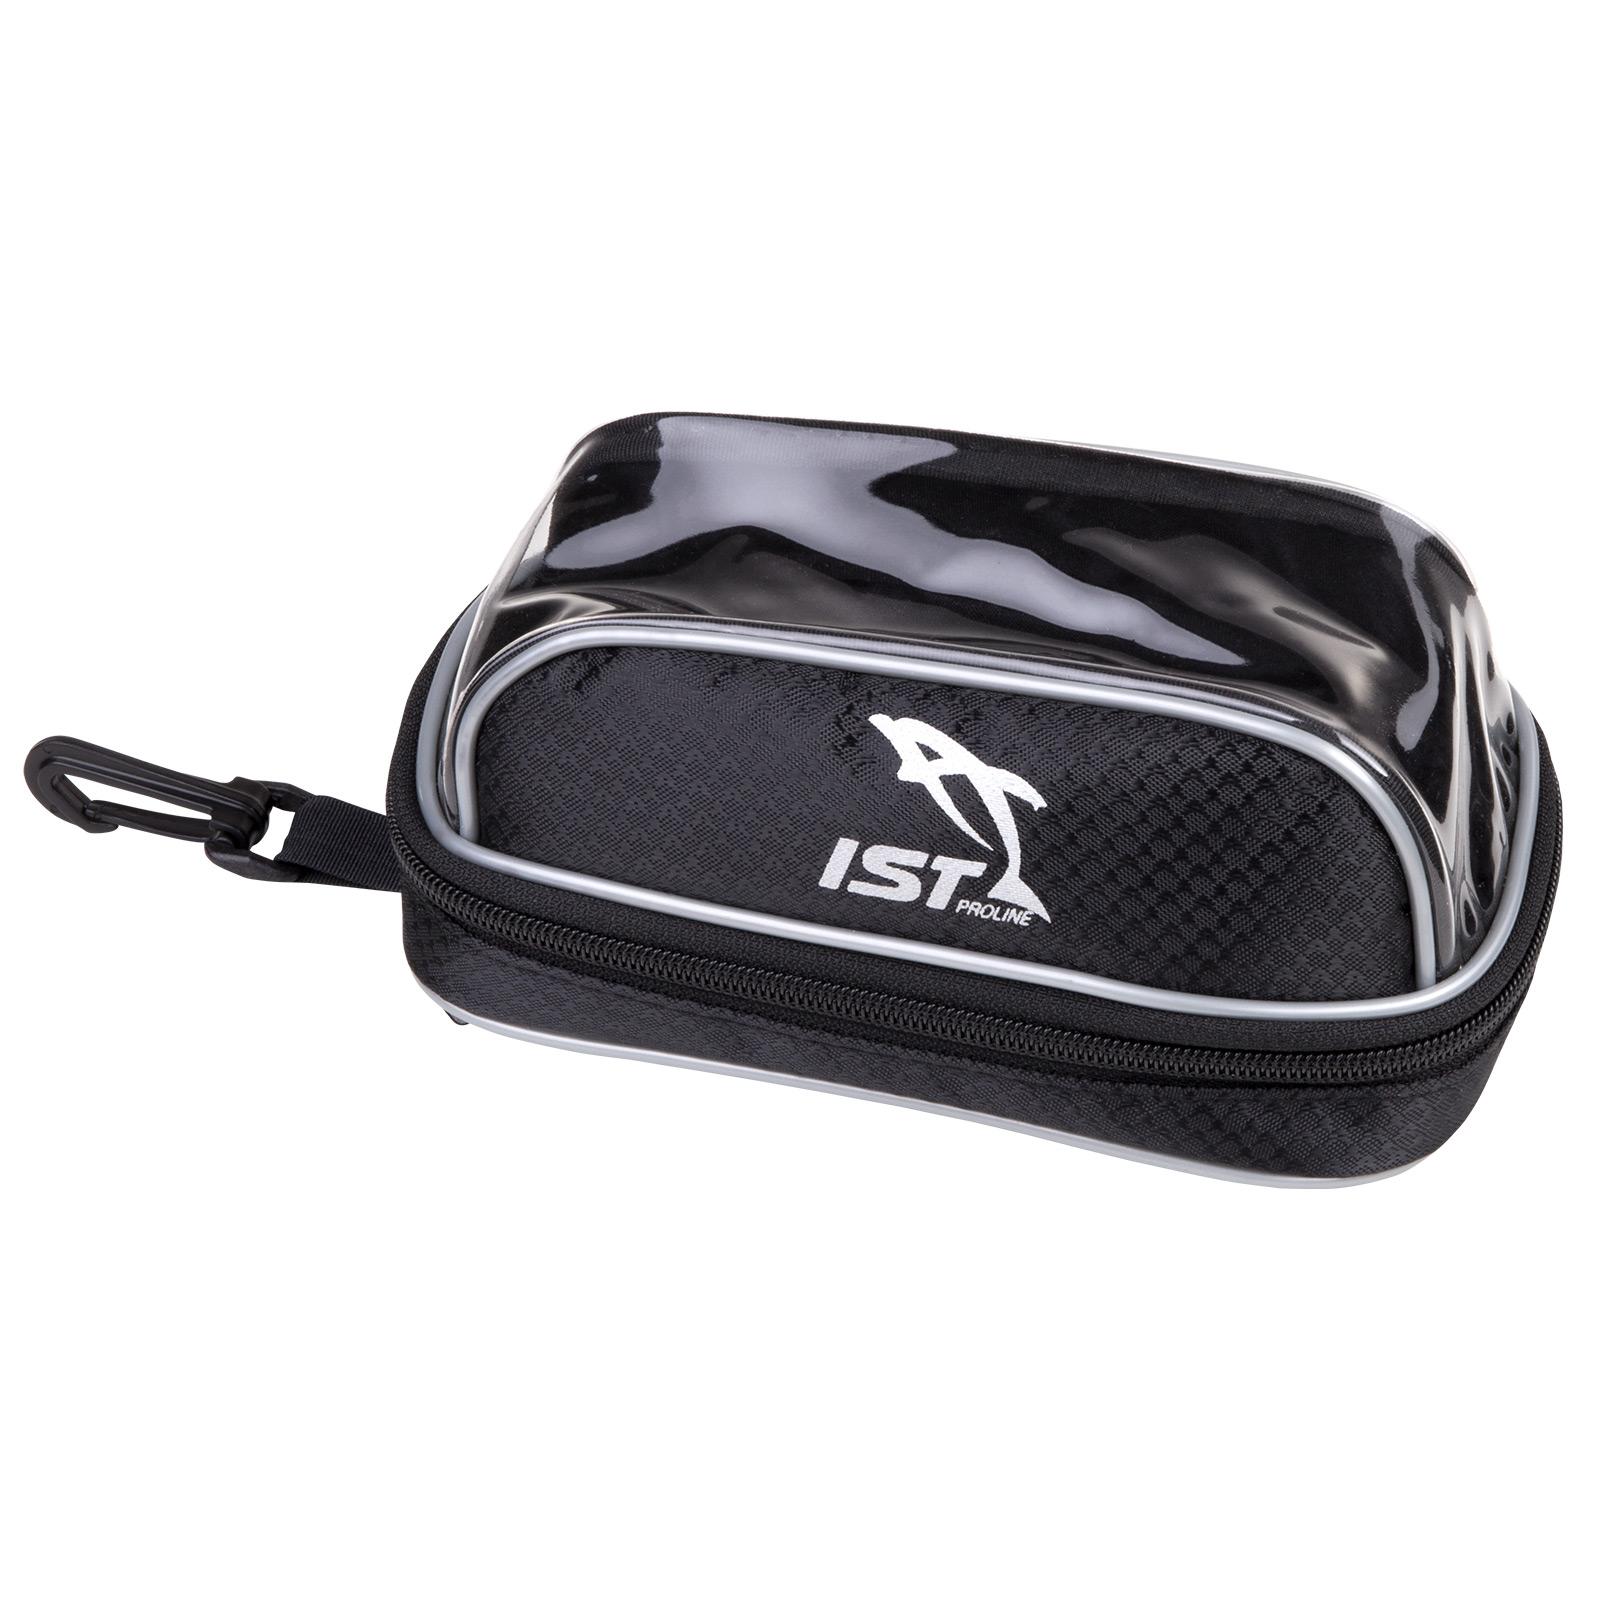 MB09 Zipper Mask Case